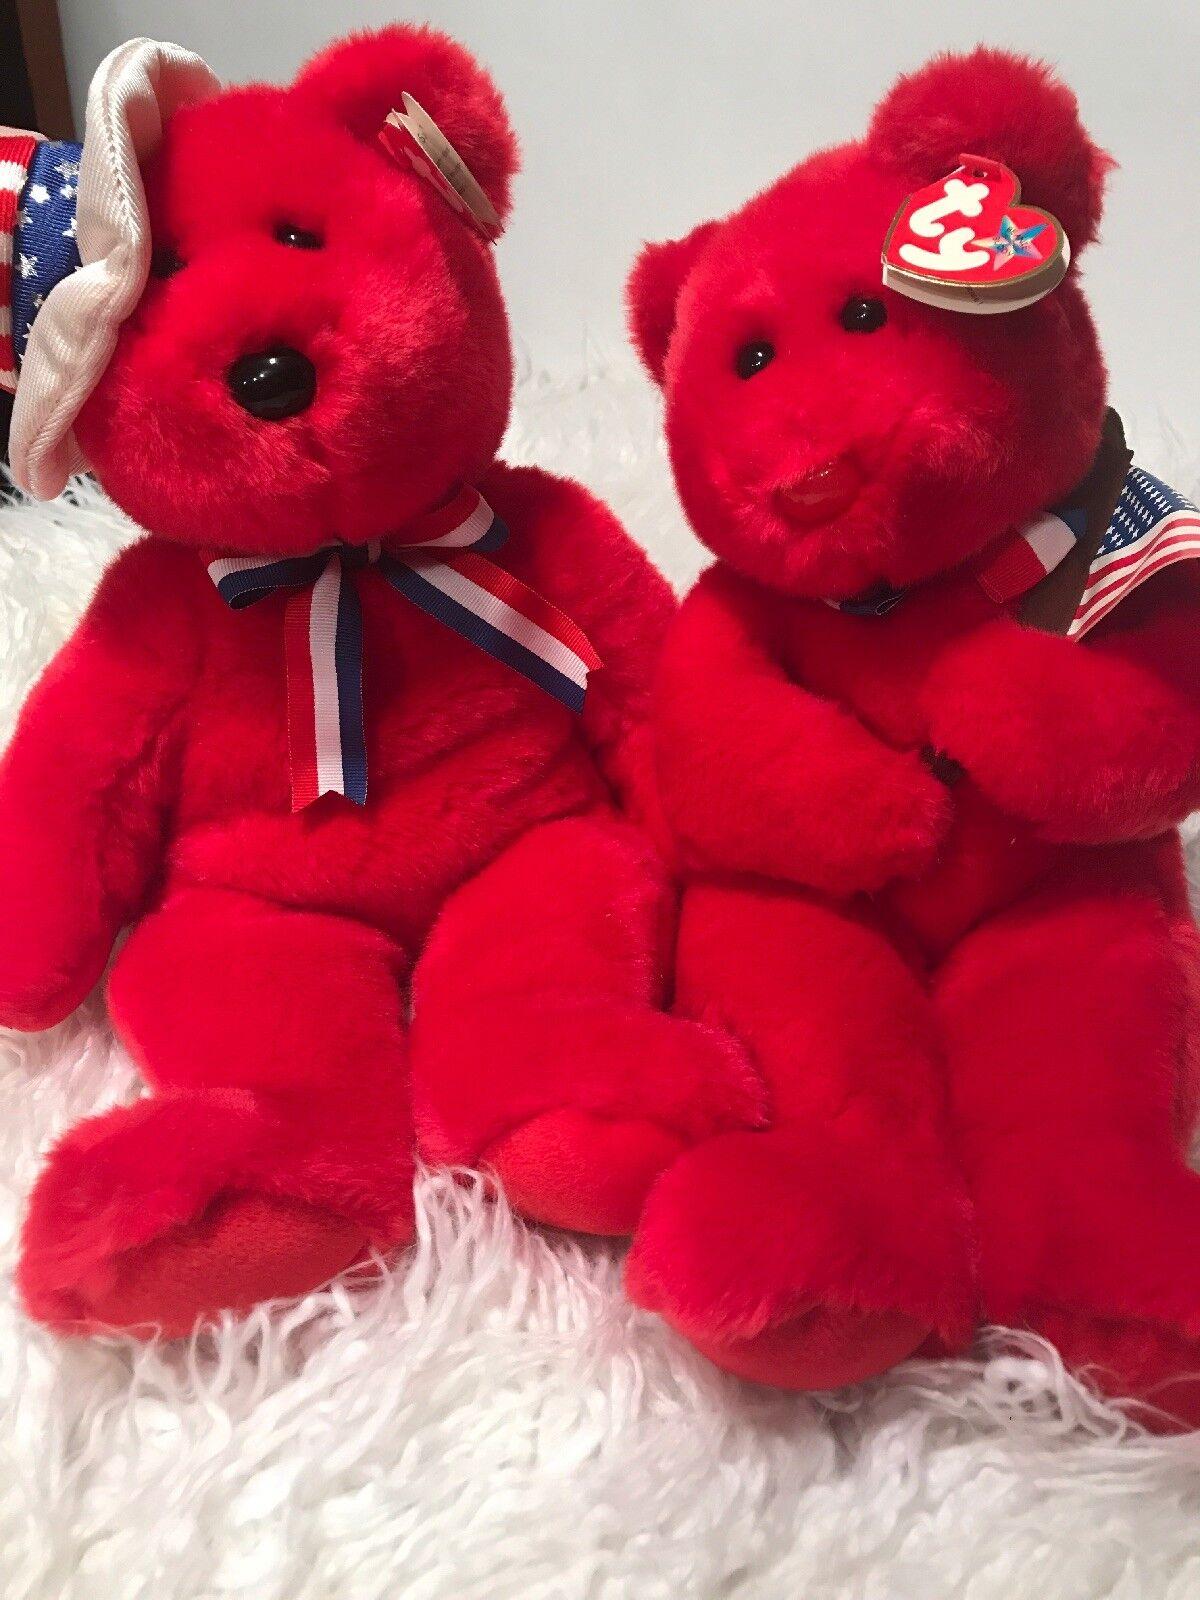 TY Beanie Buddy - THOMAS the Bear (14.5 inch) - MWMTs Stuffed Animal Toy